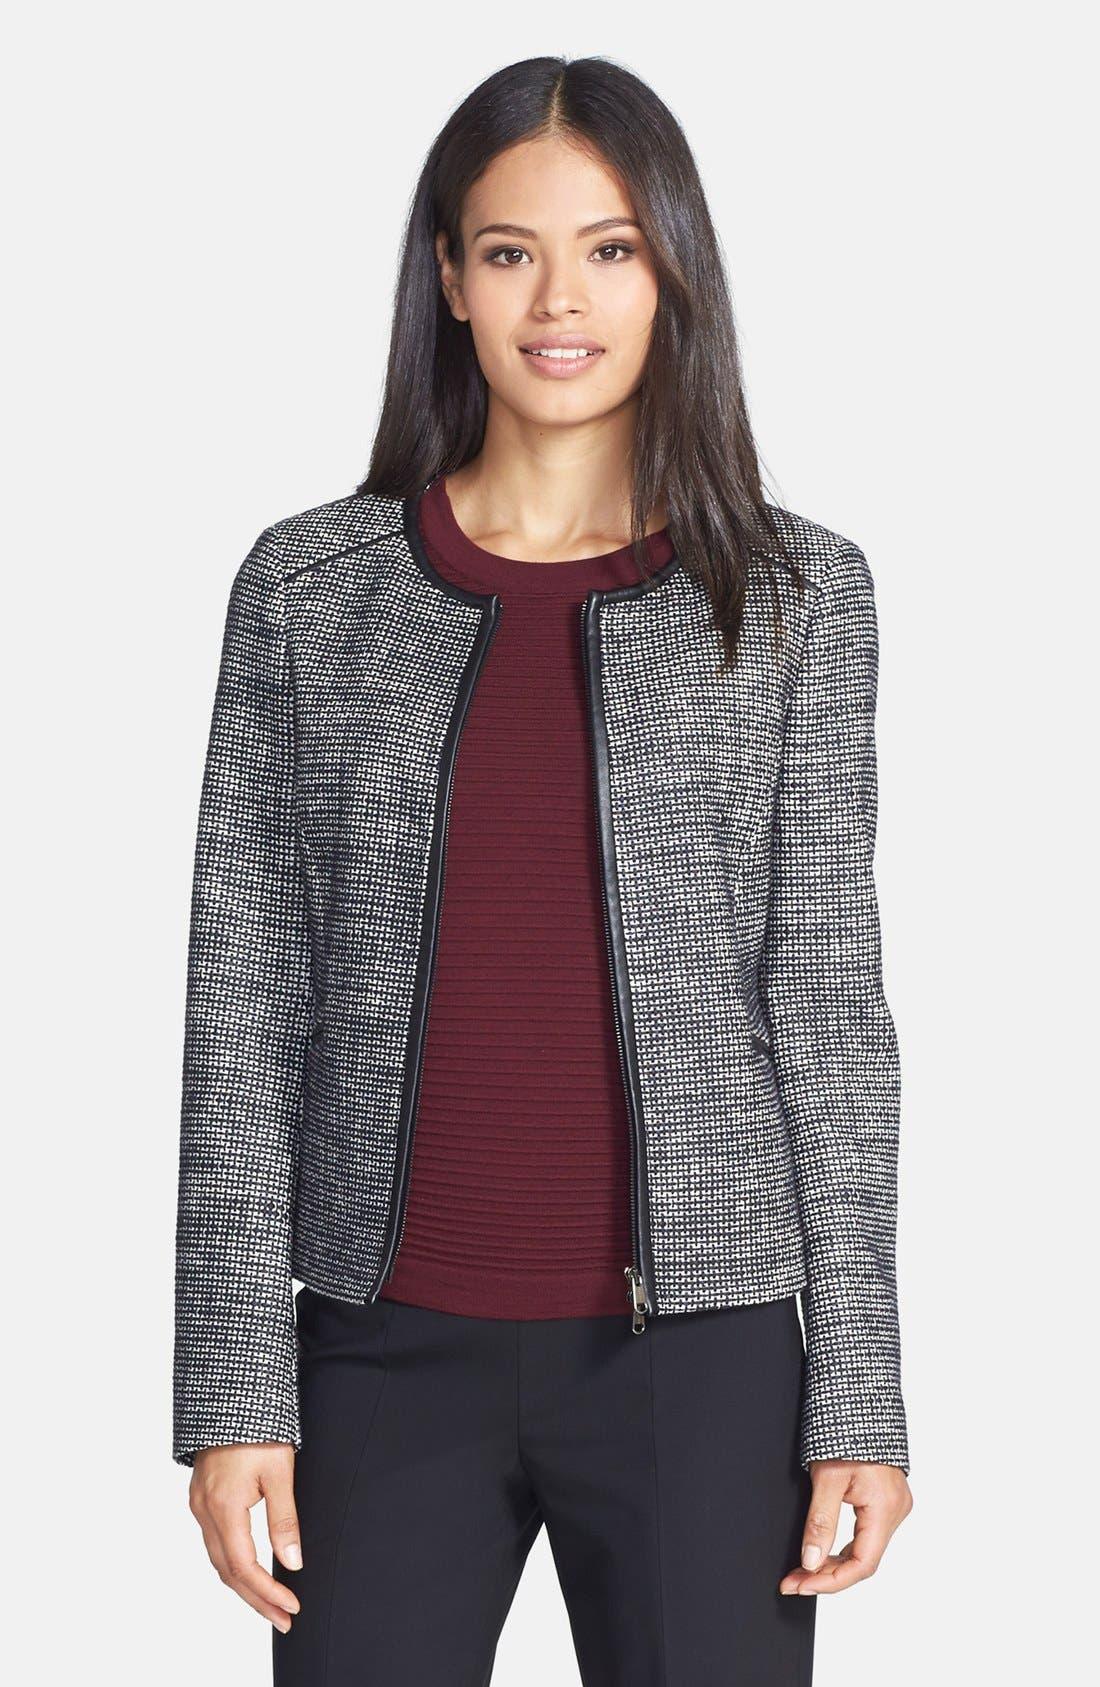 Main Image - BOSS 'Koralia' Leather Trim Collarless Tweed Jacket